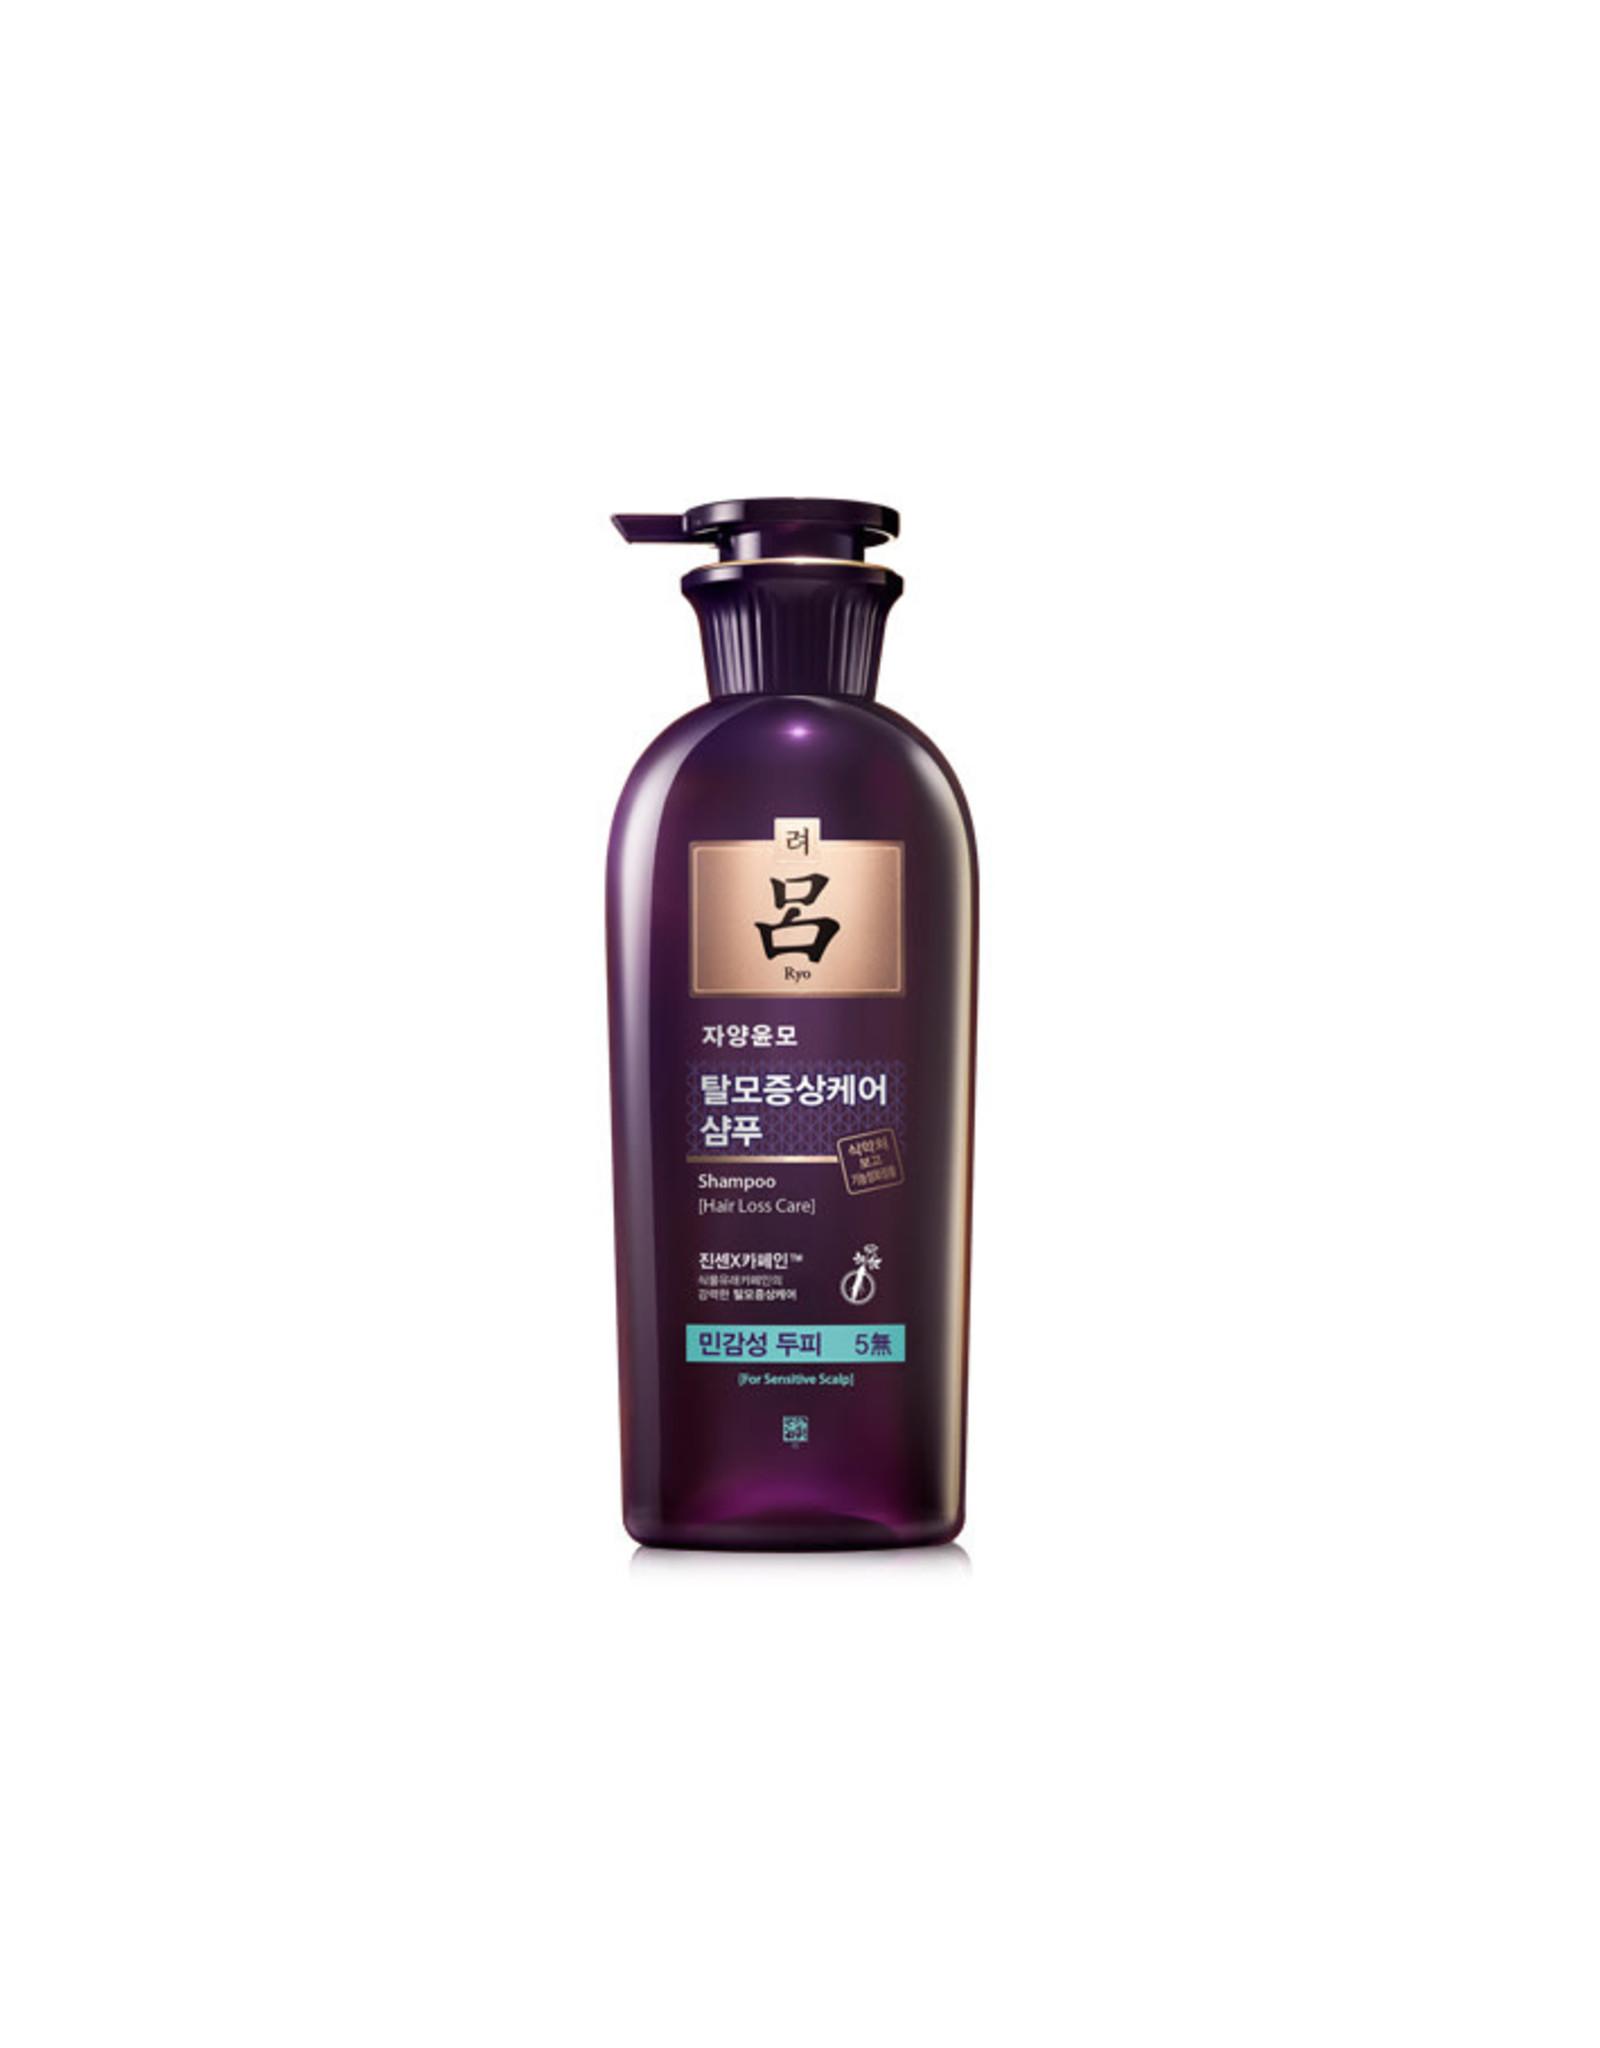 Ryo Ryo Jayangyunmo Hair Loss Shampoo 400ml Sensitive Scalp